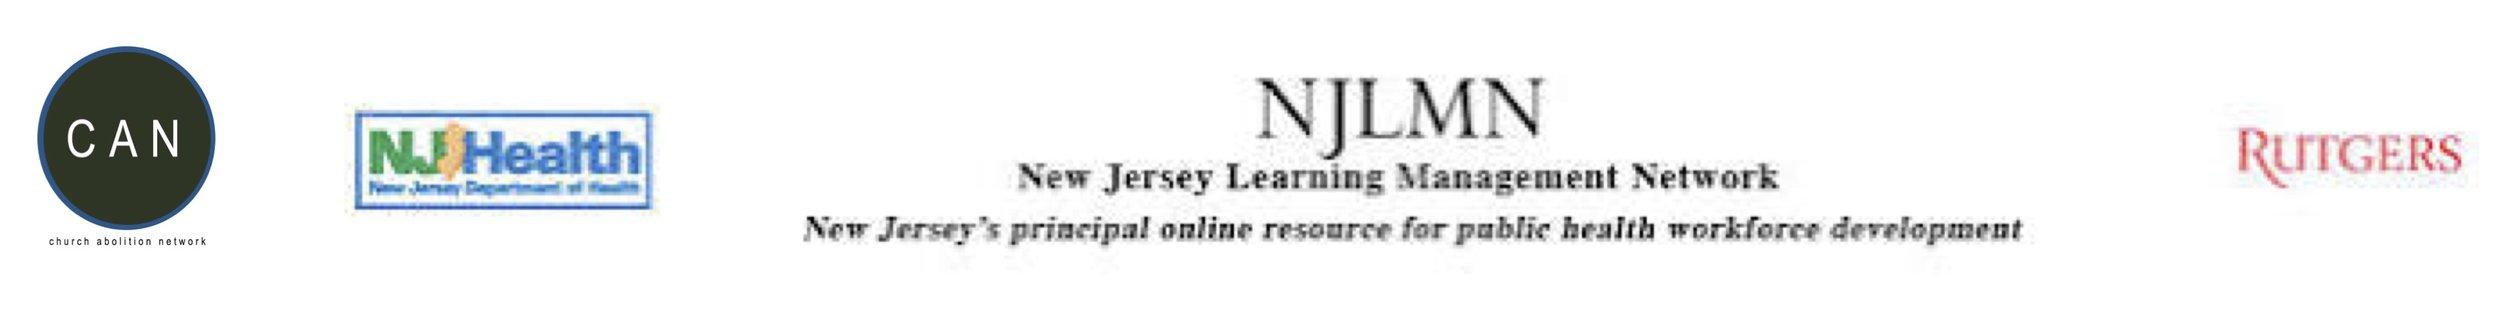 CAN NJLMN logo image.jpg